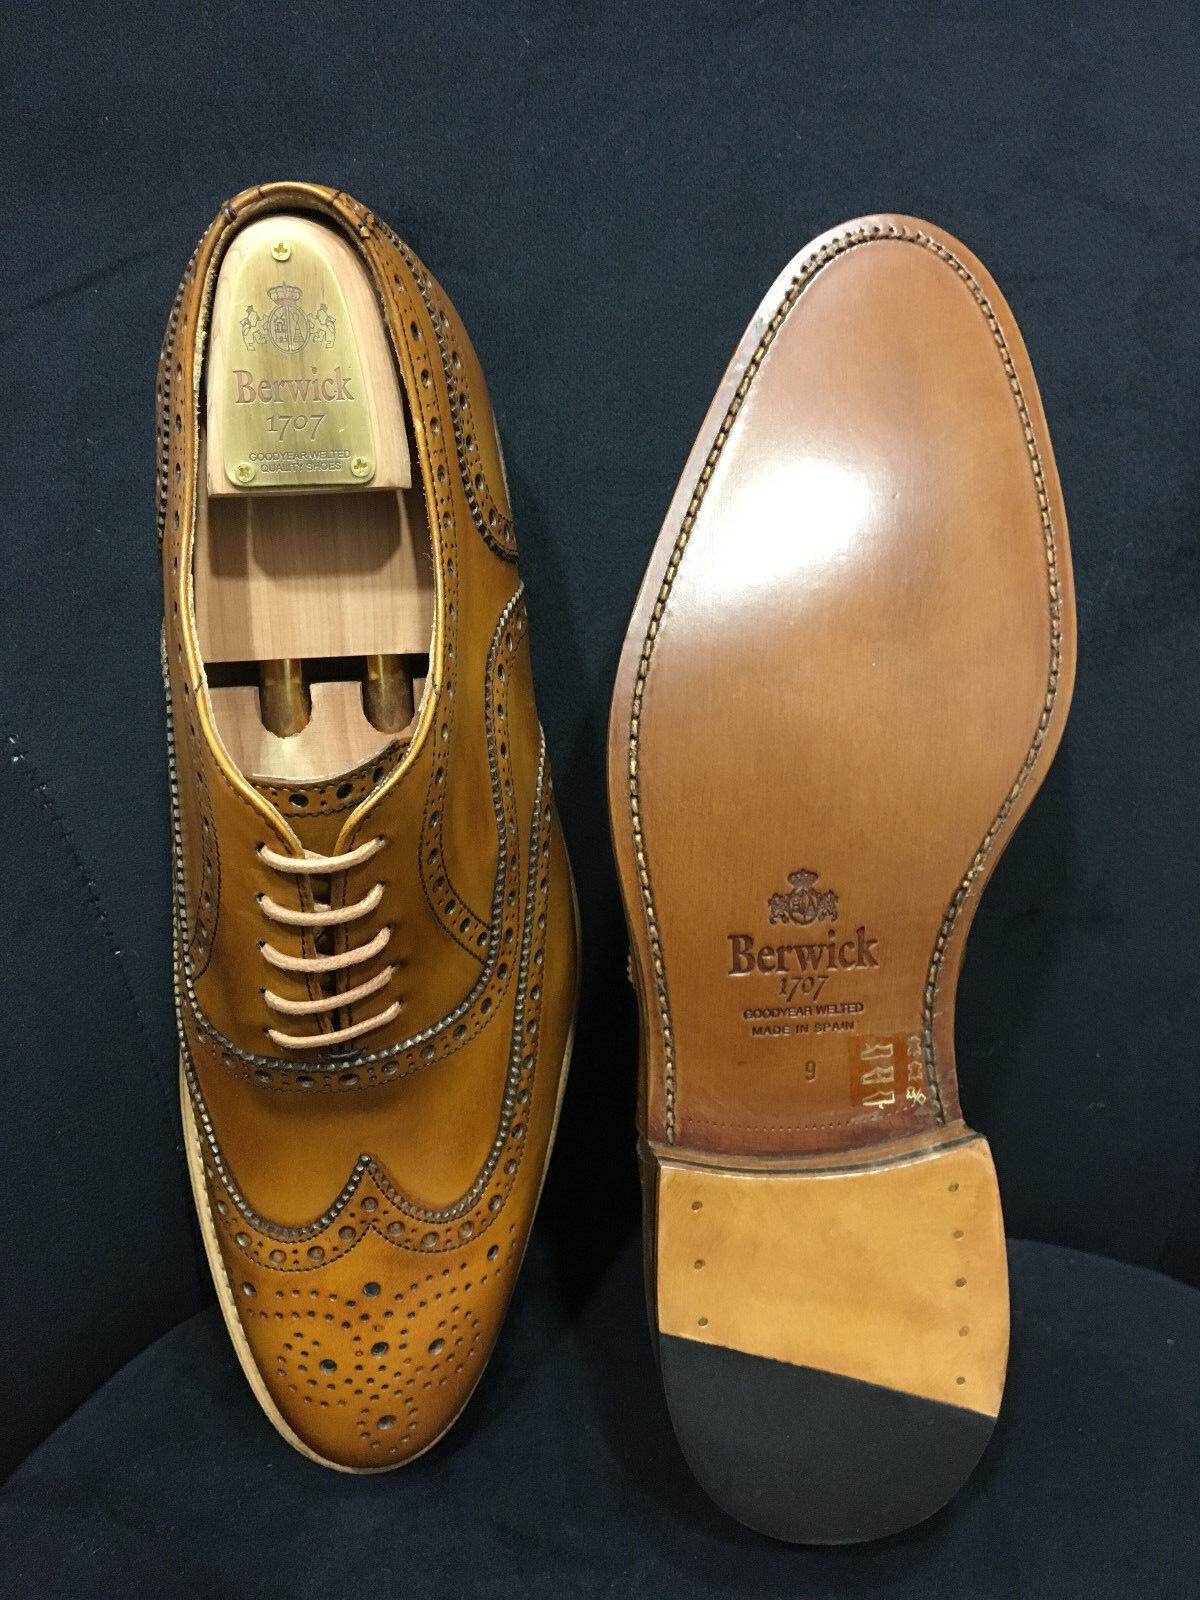 Berwick 1707 Scarpa Scarpa Scarpa in pelle Oxford COGNAC Goodyear Welted Bordi cuciti GR: 39 - 46 604a8d